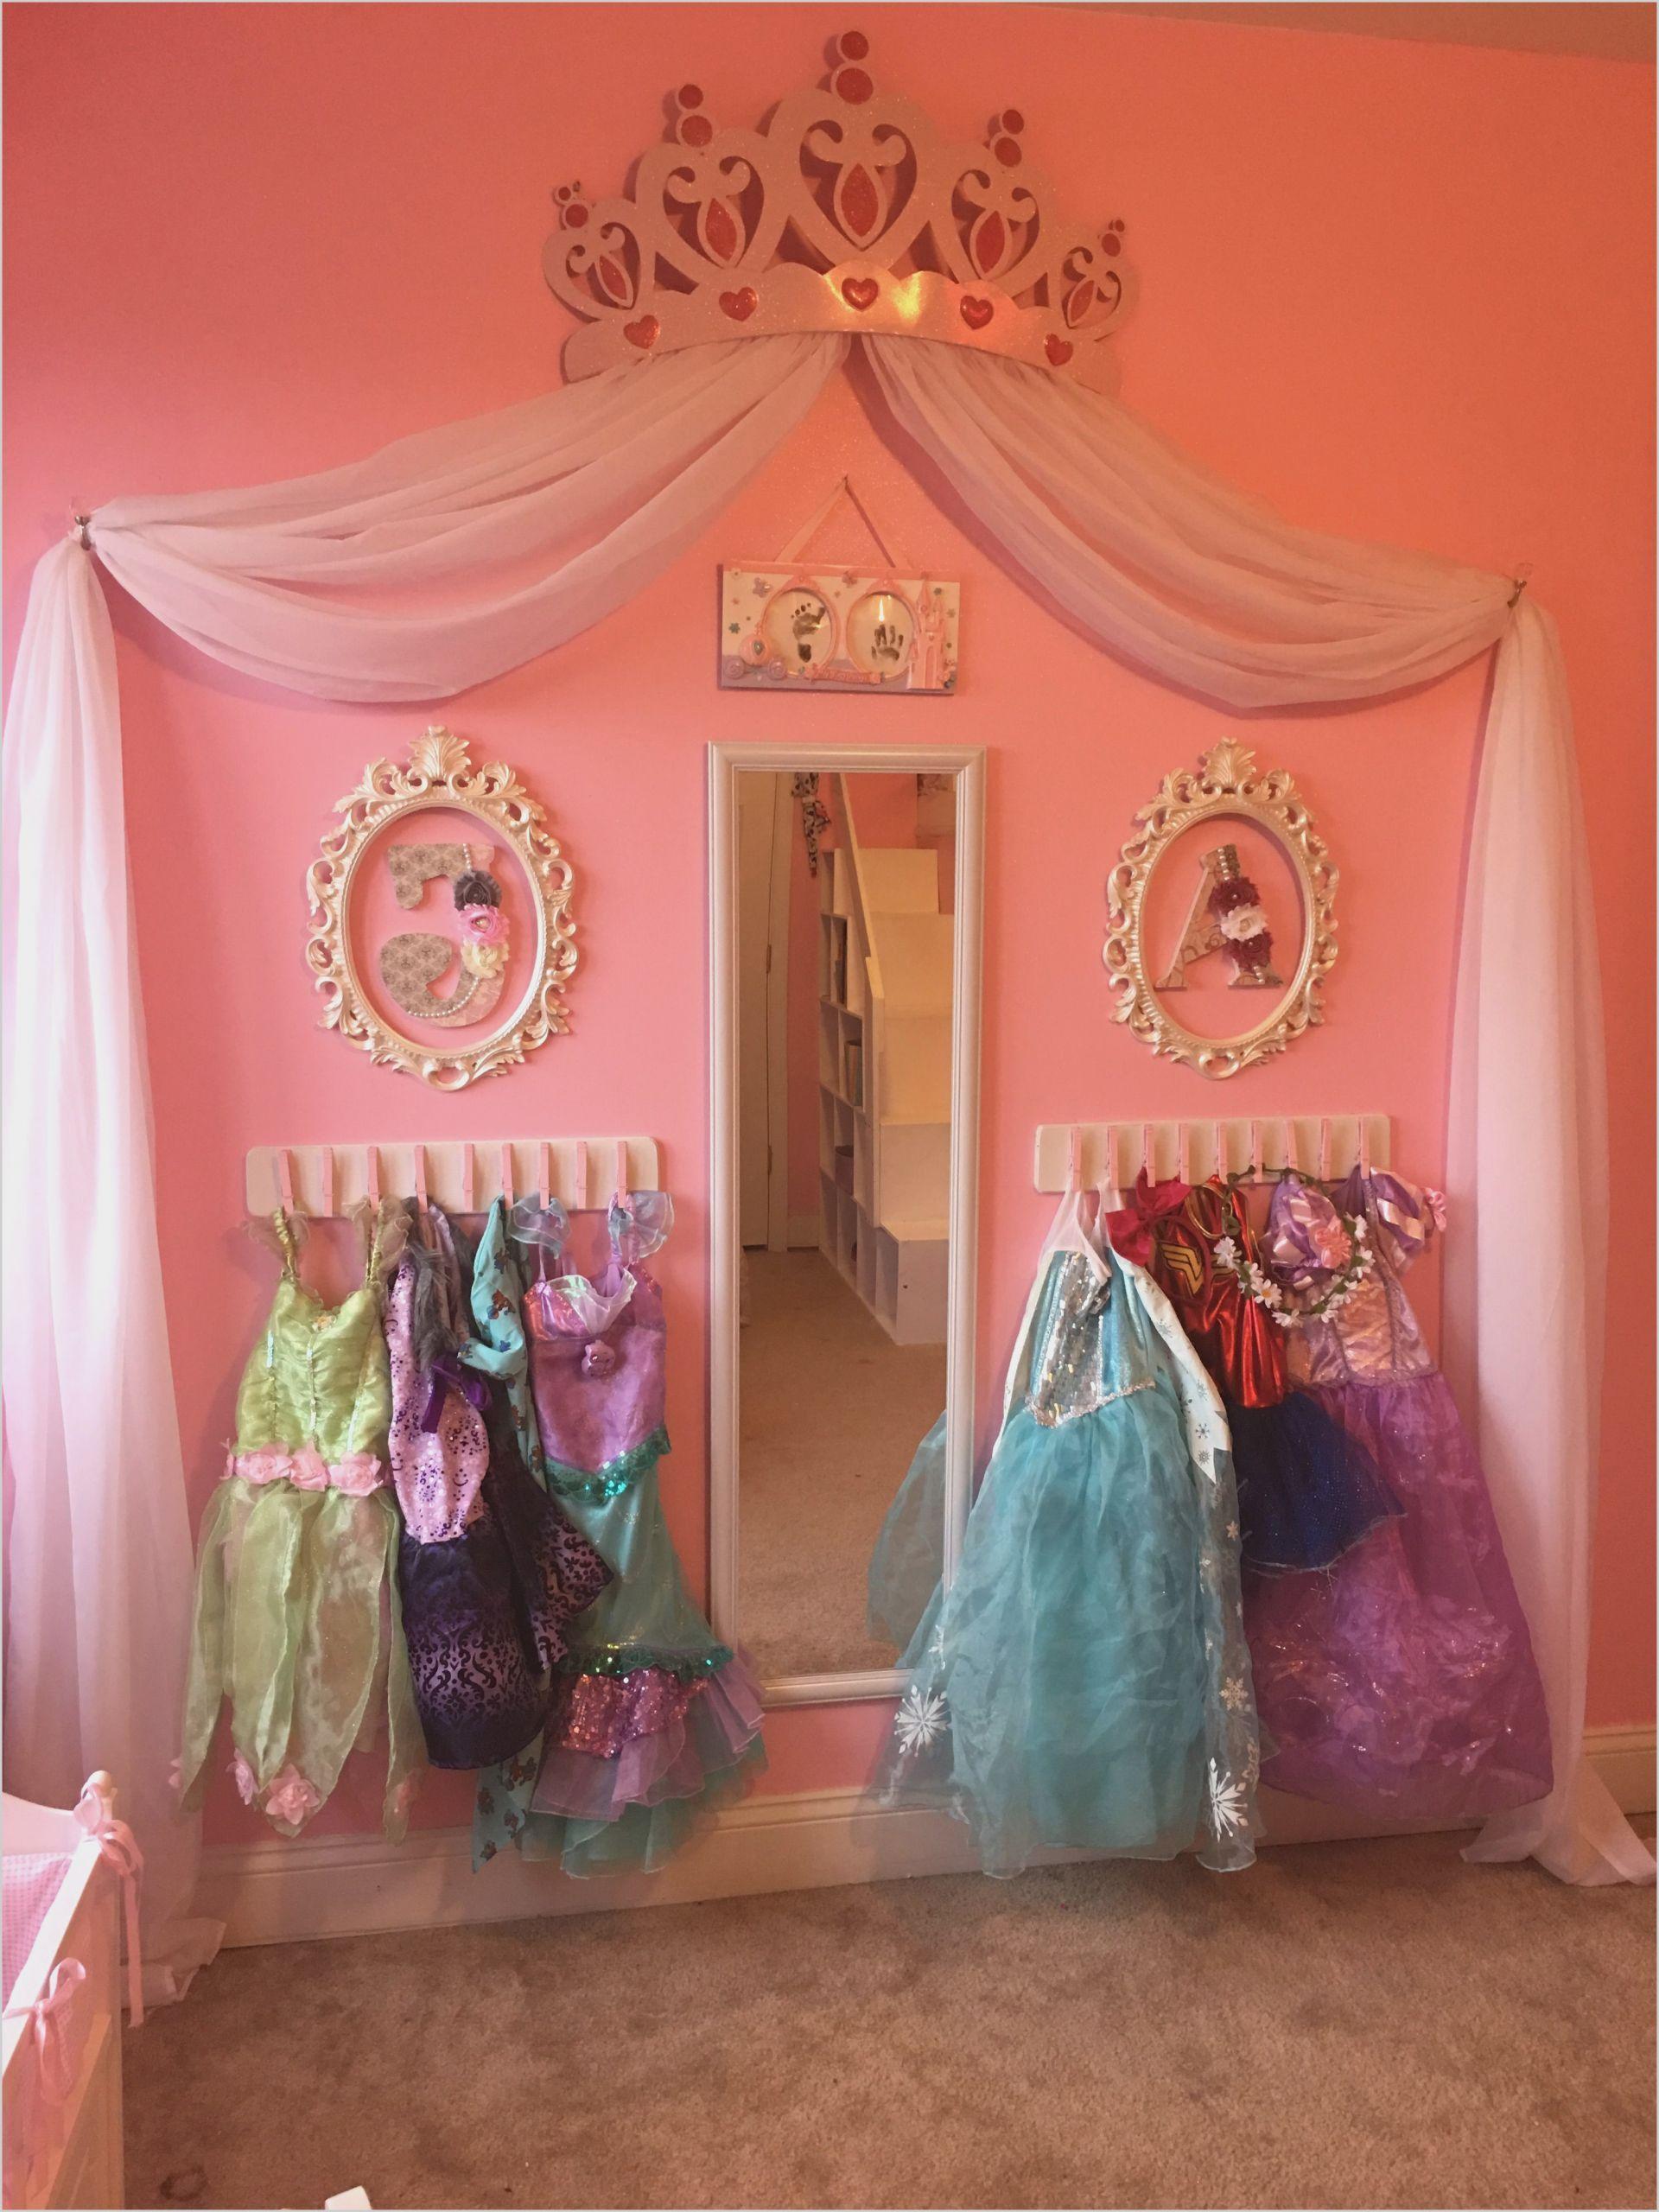 Disney Princess Bedroom Ideas Uk In 2020 Baby Room Themes Disney Princess Bedroom Toddler Bedroom Girl